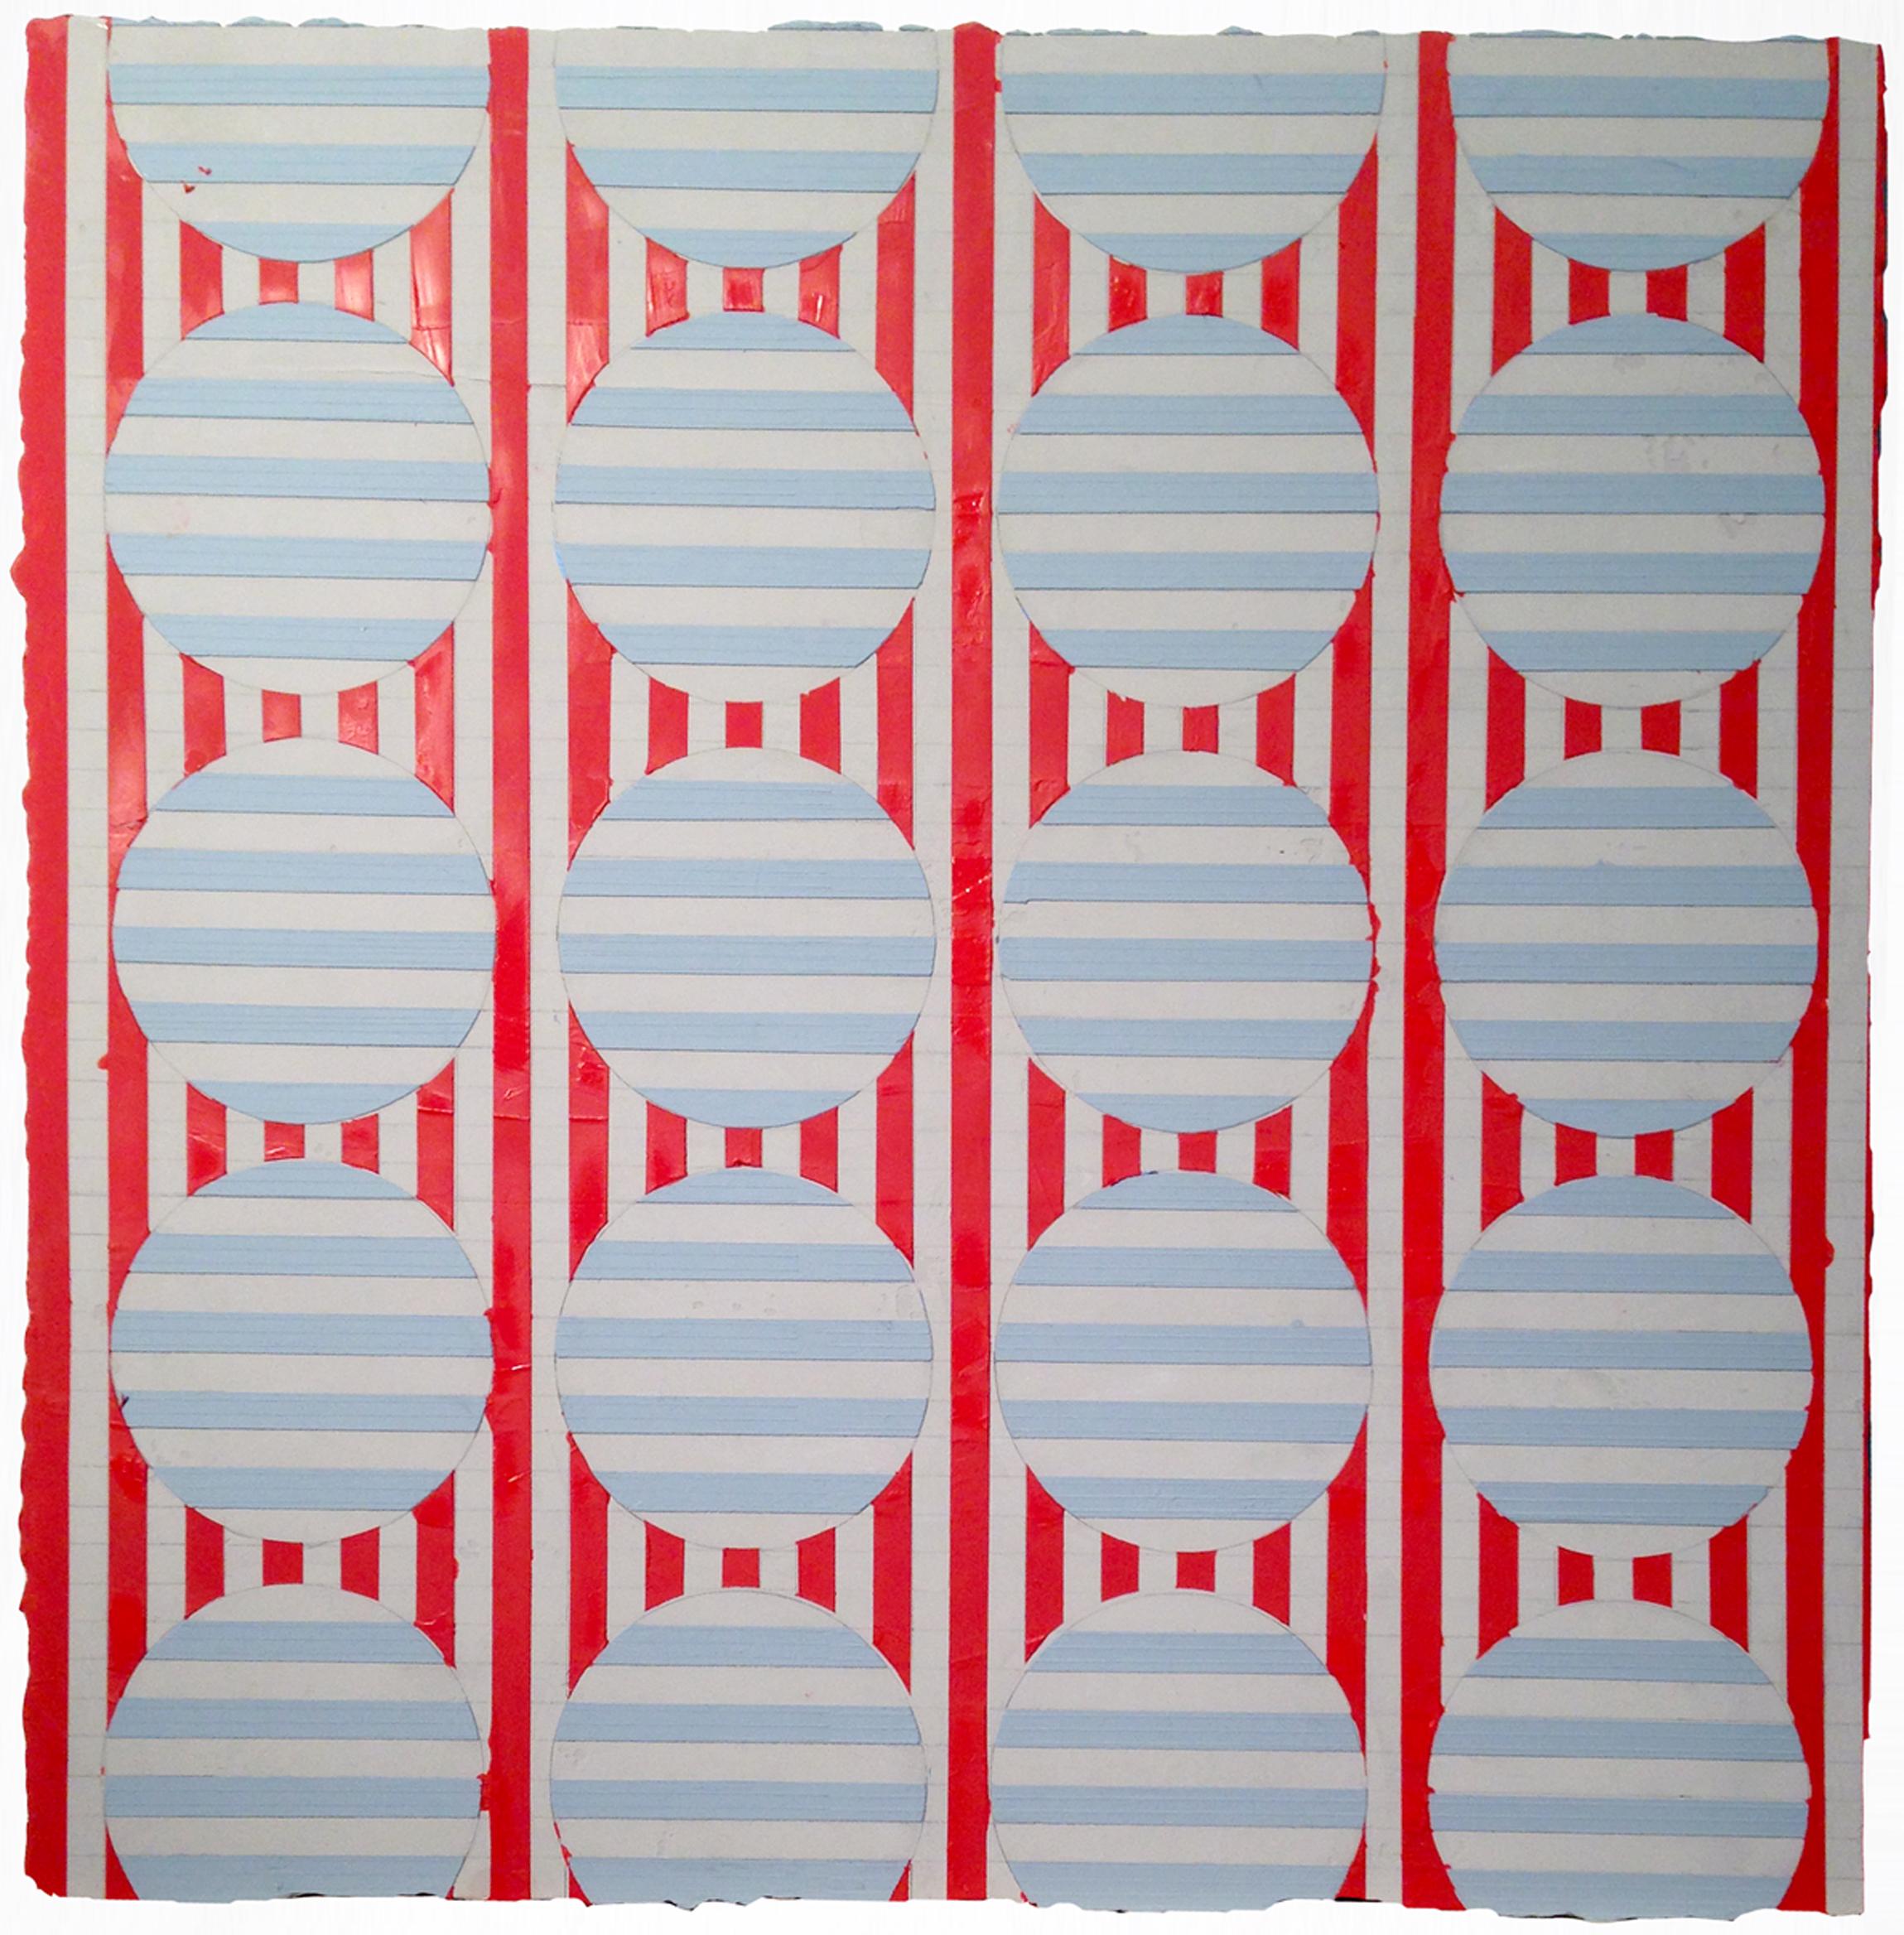 "ELISE FERGUSON   J Bird , pigmented plaster on MDF panel, 24"" x 24"", 2014"